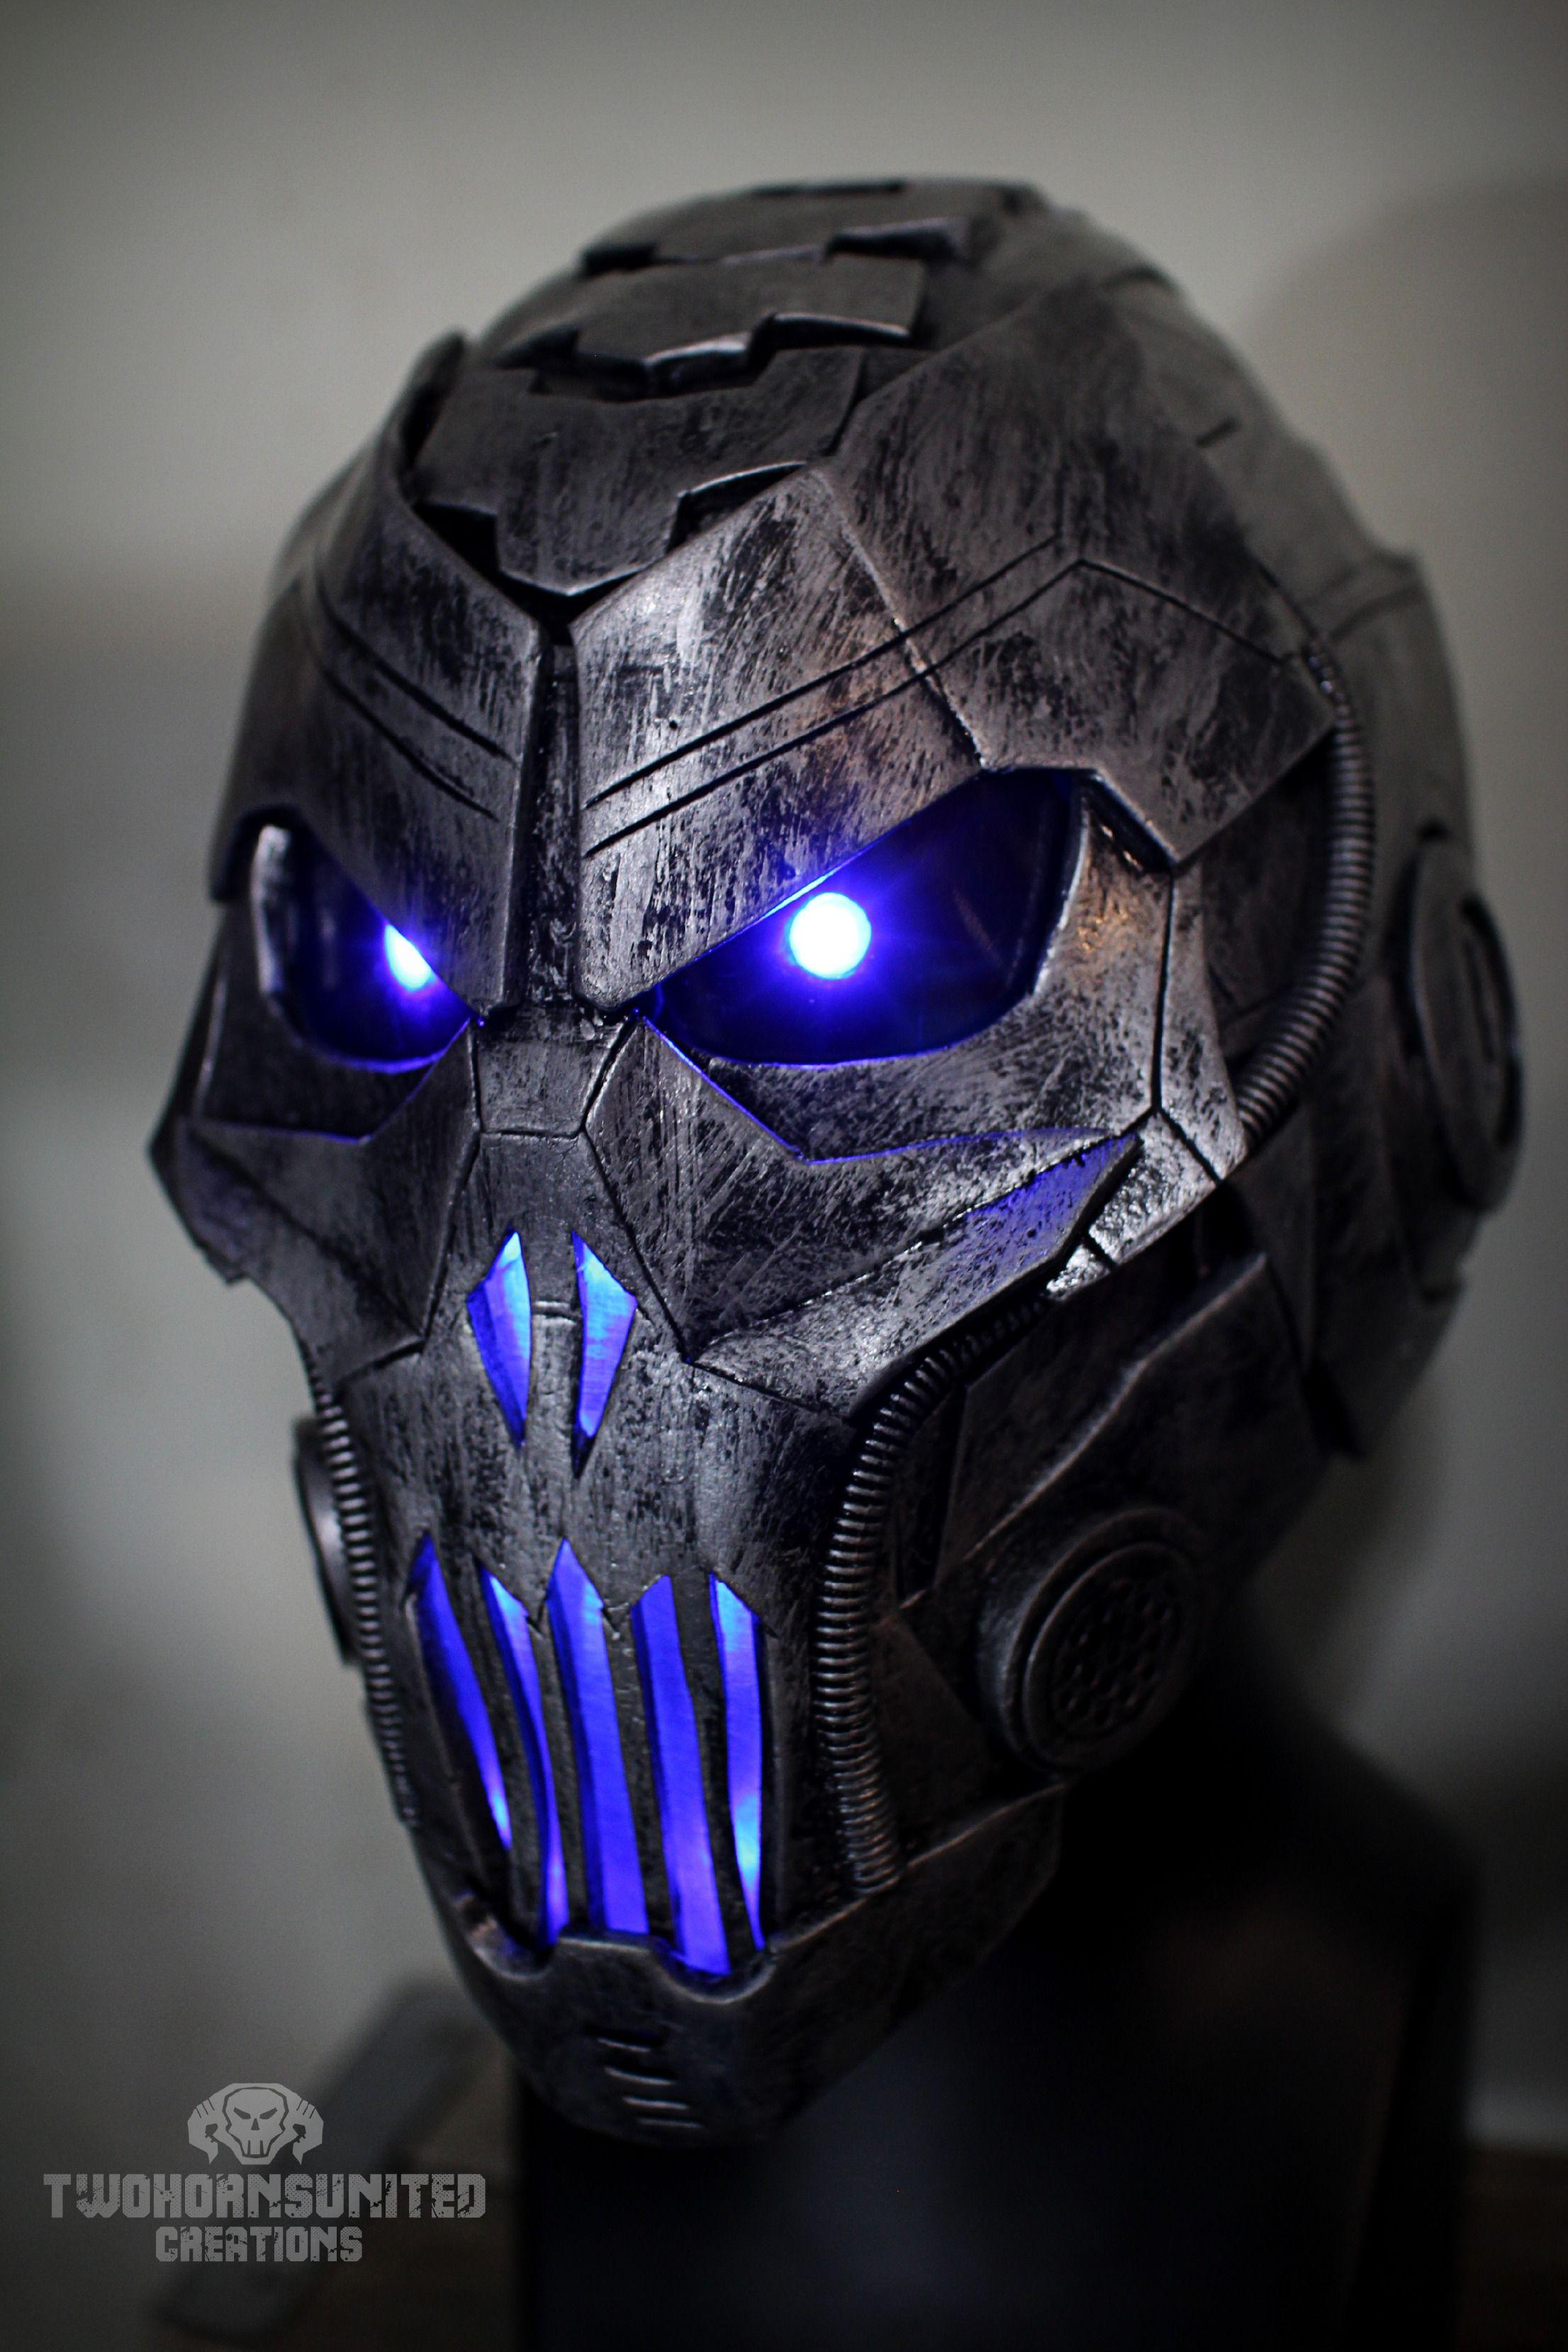 The Grave Ender V1 0 Light Up Cyber Dj Helm By